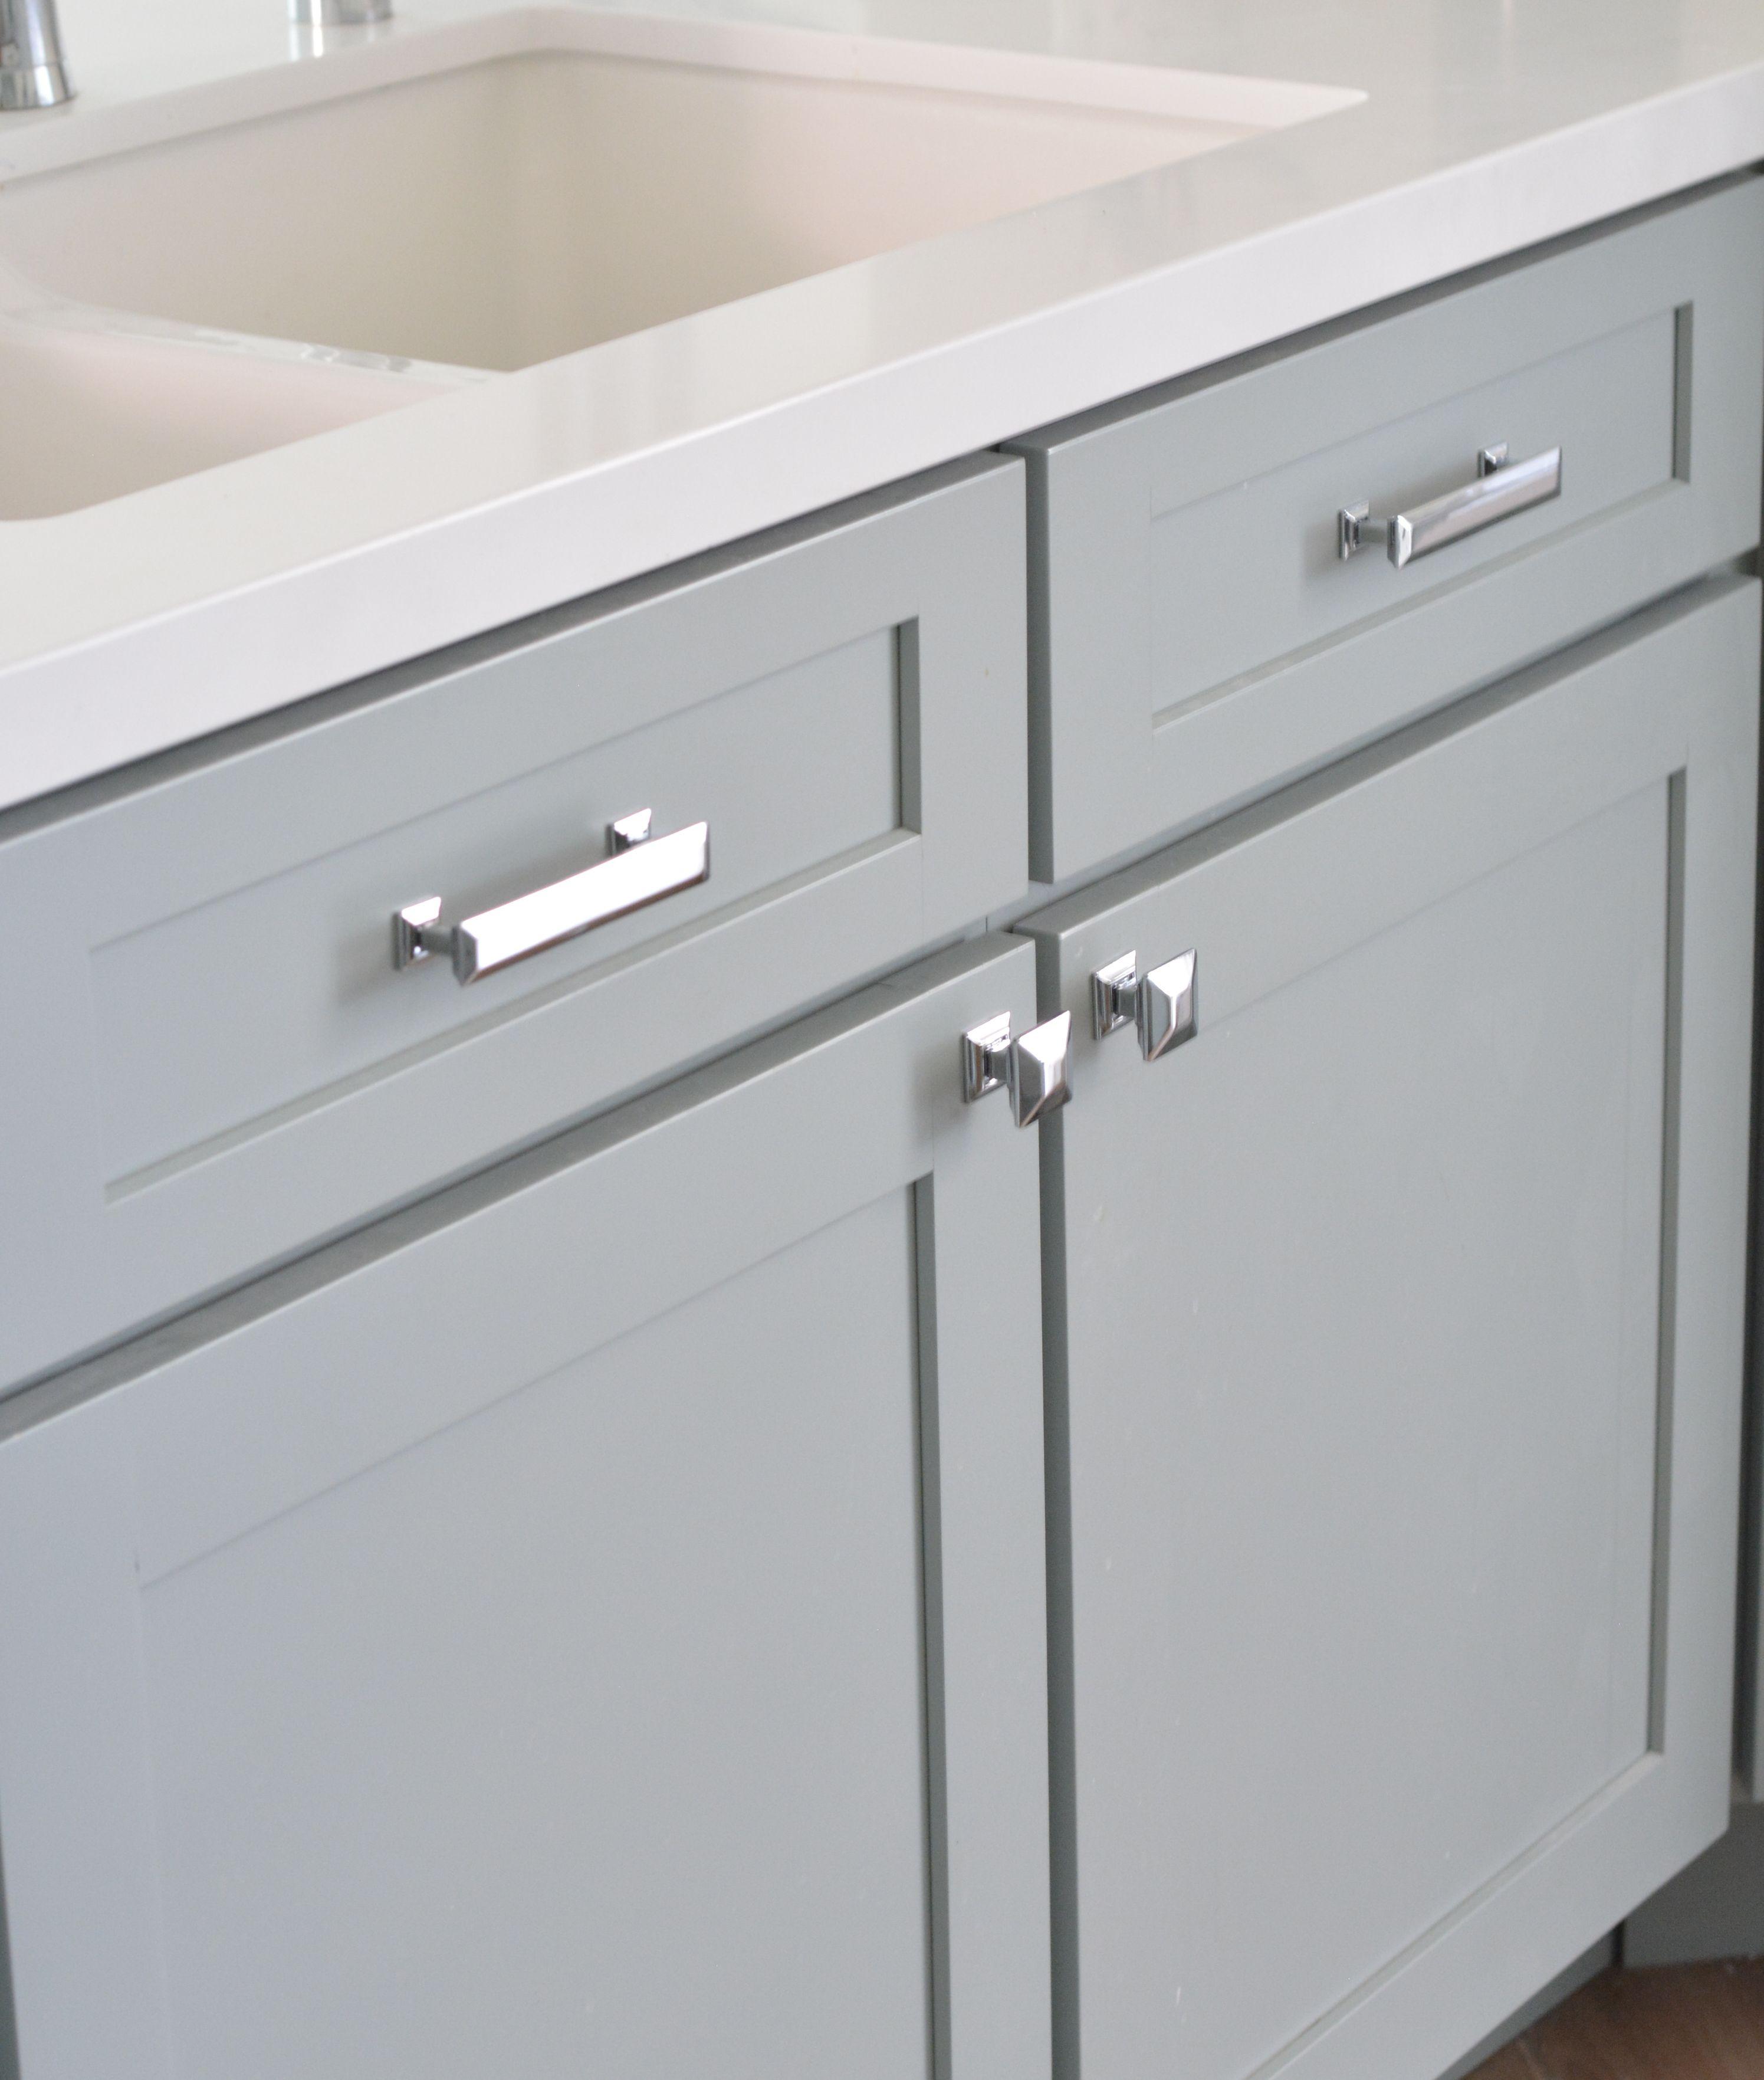 cabinet hardware | home ideas in 2018 | Pinterest ...